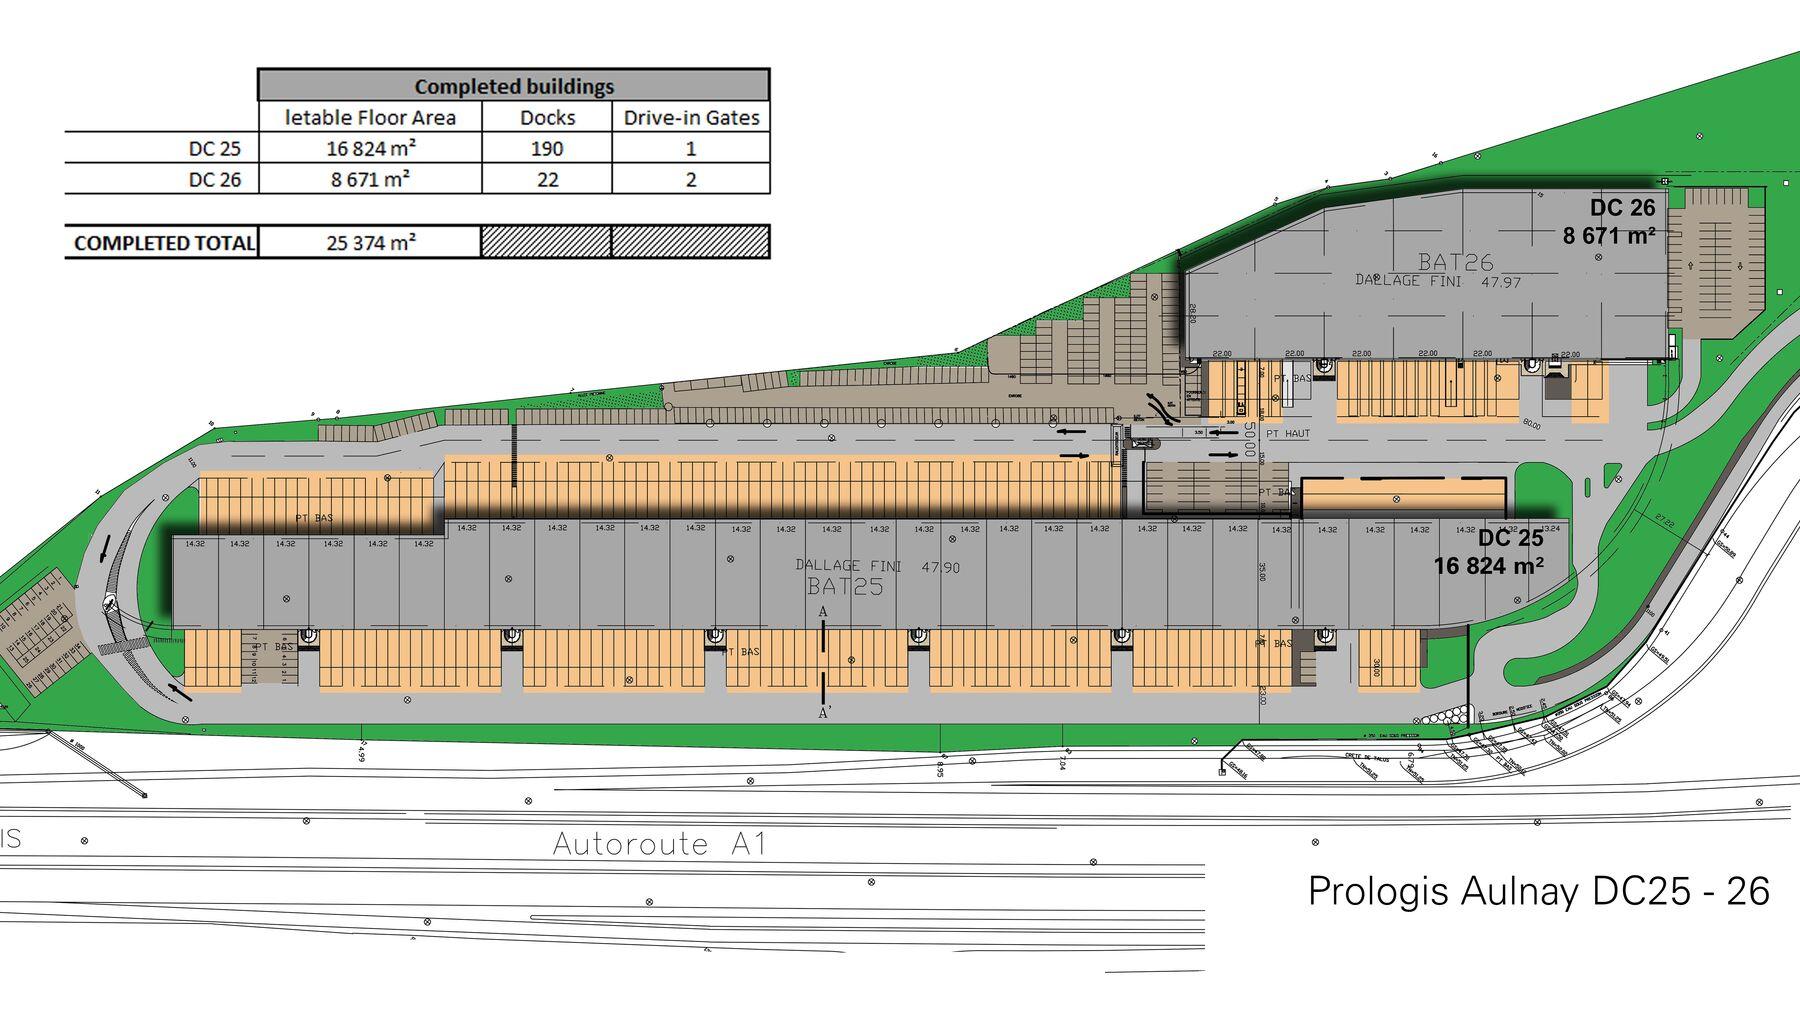 DPM-Aulnay-DC25-26_site-layout.jpg